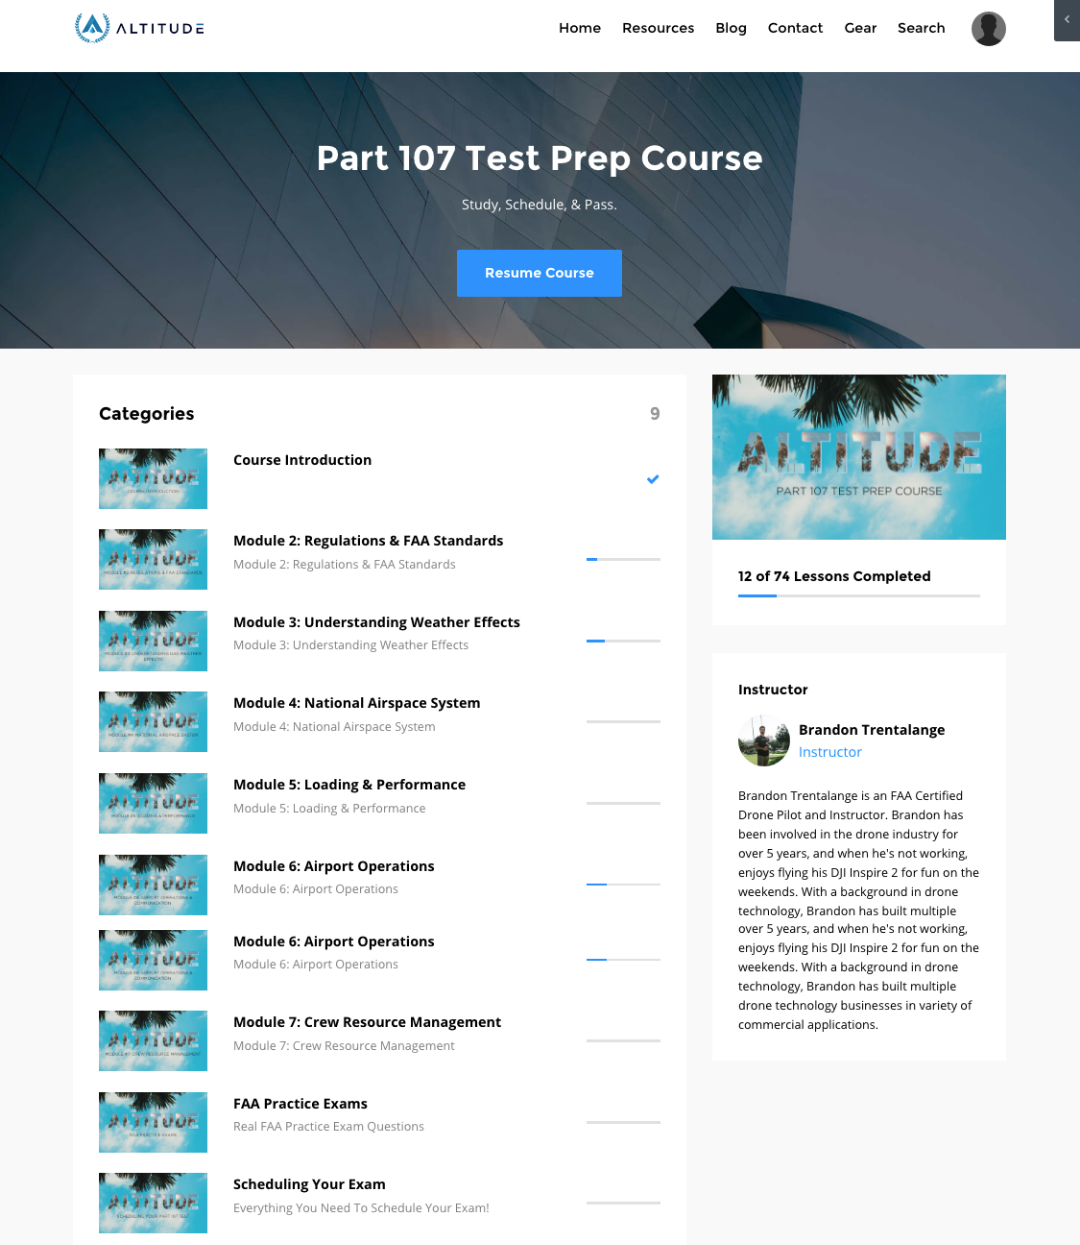 Inside Preview of Altitude University Online Part 107 Test Prep Course